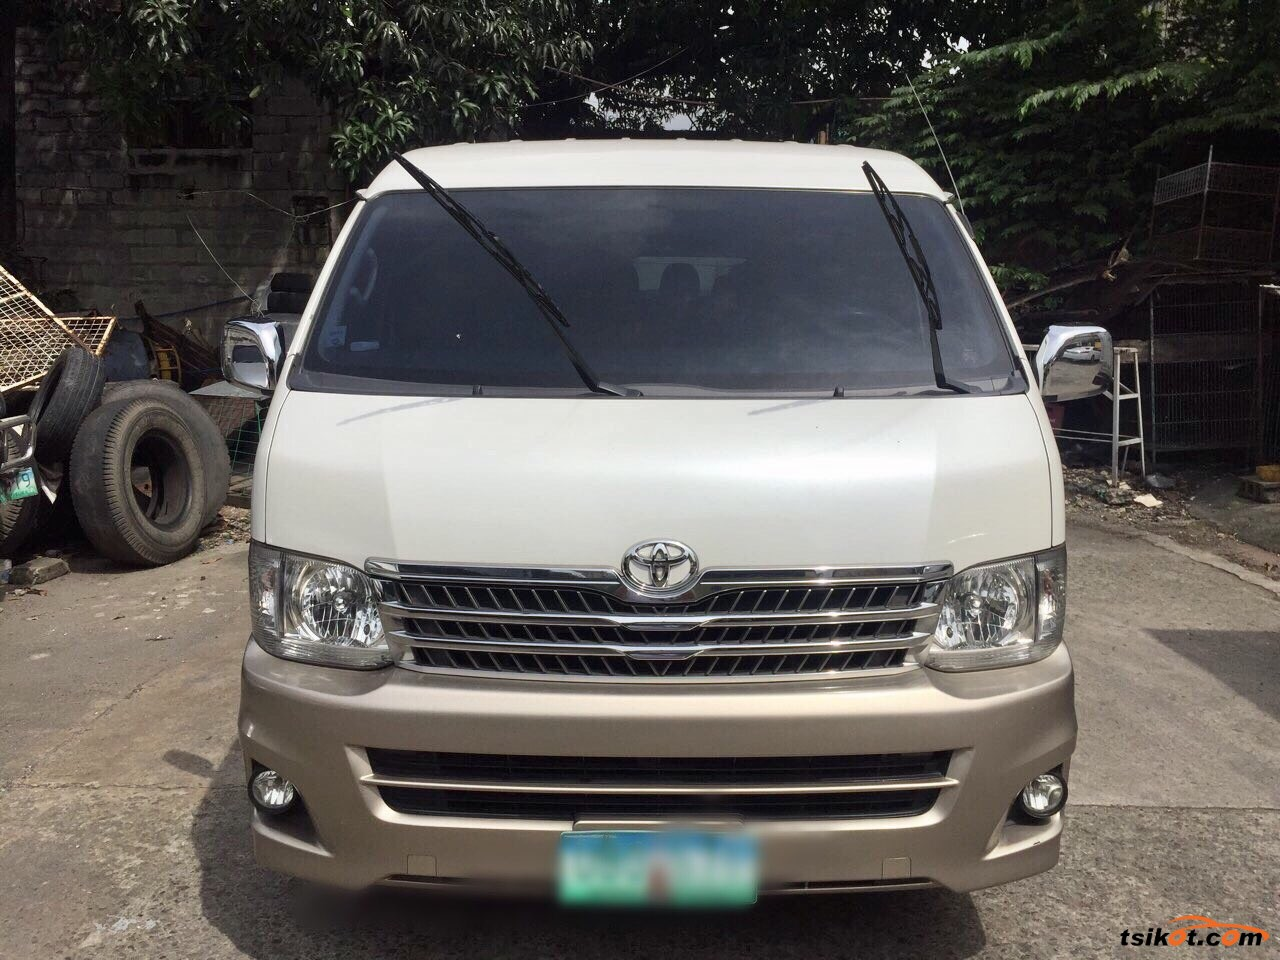 Toyota Super 2013 - 2